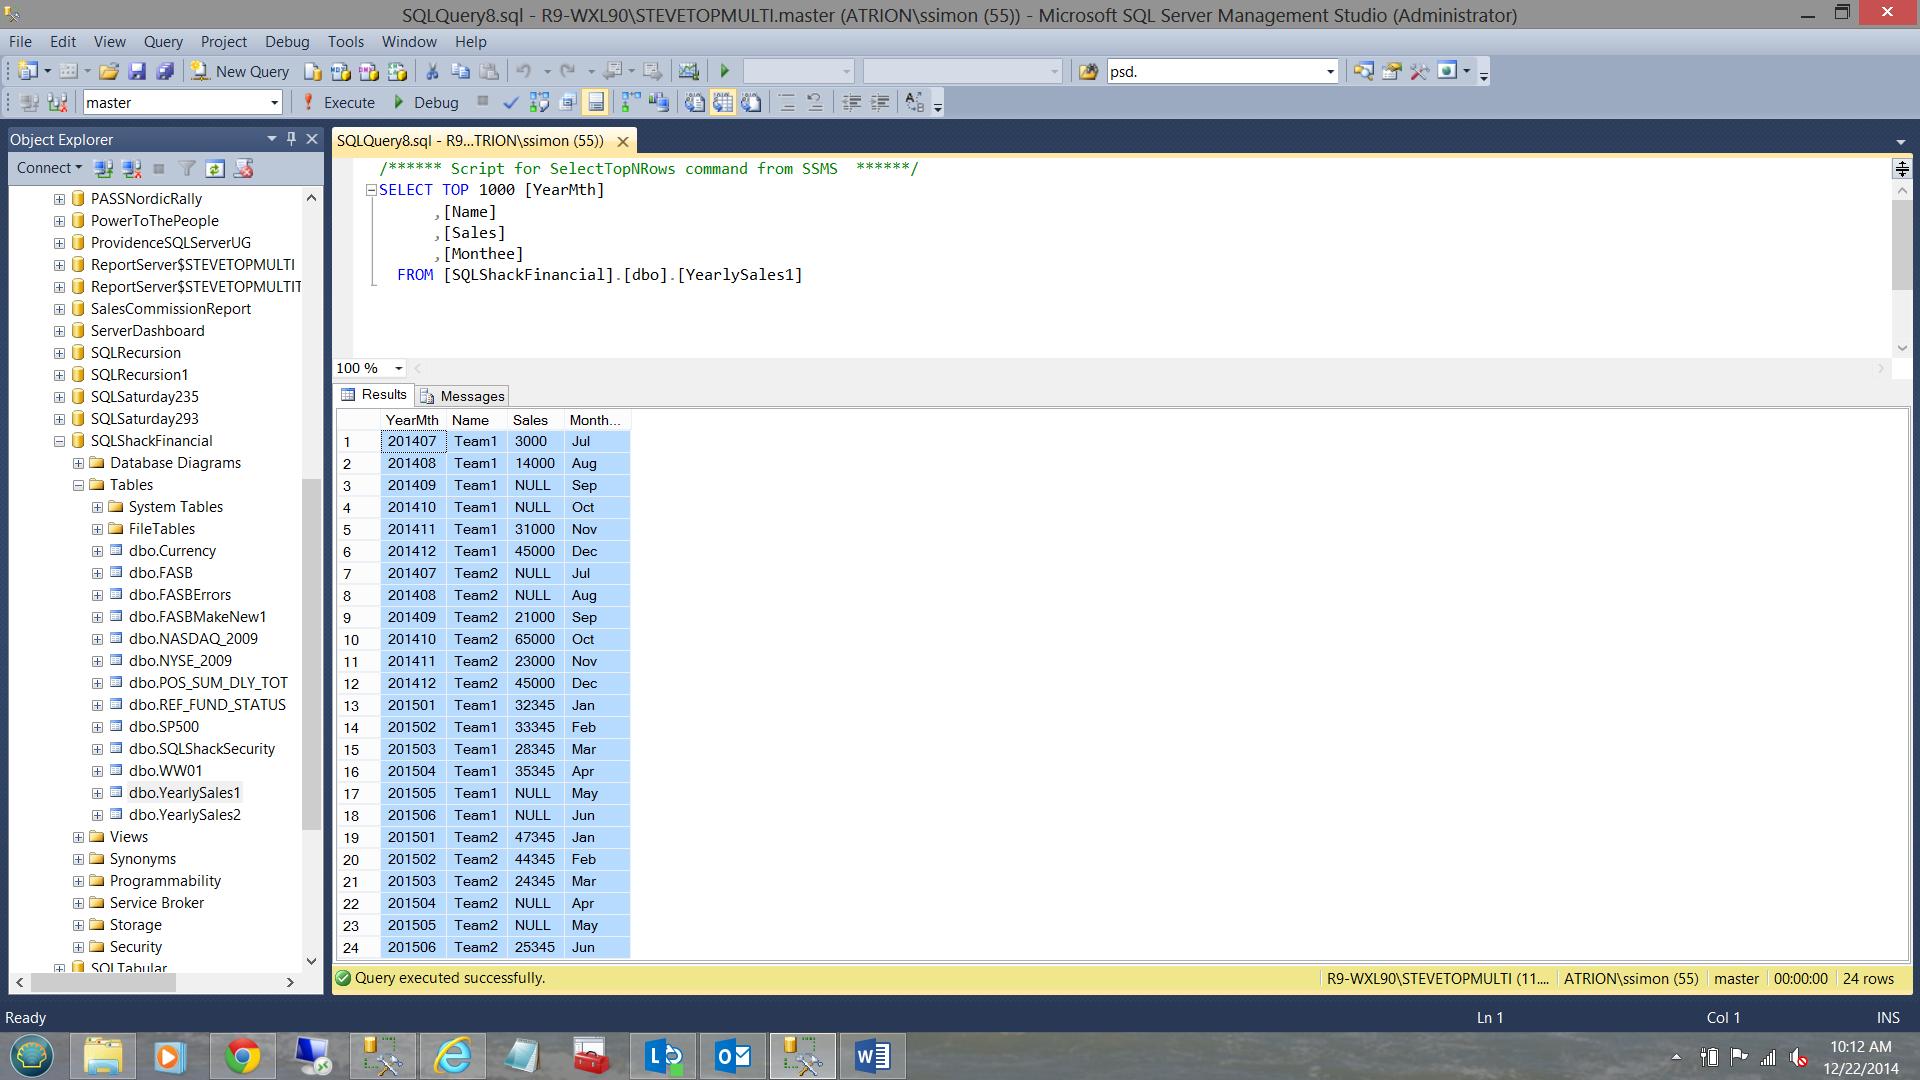 SQL Server安全机制–如何控制用户能够在报告中查看哪些数据1